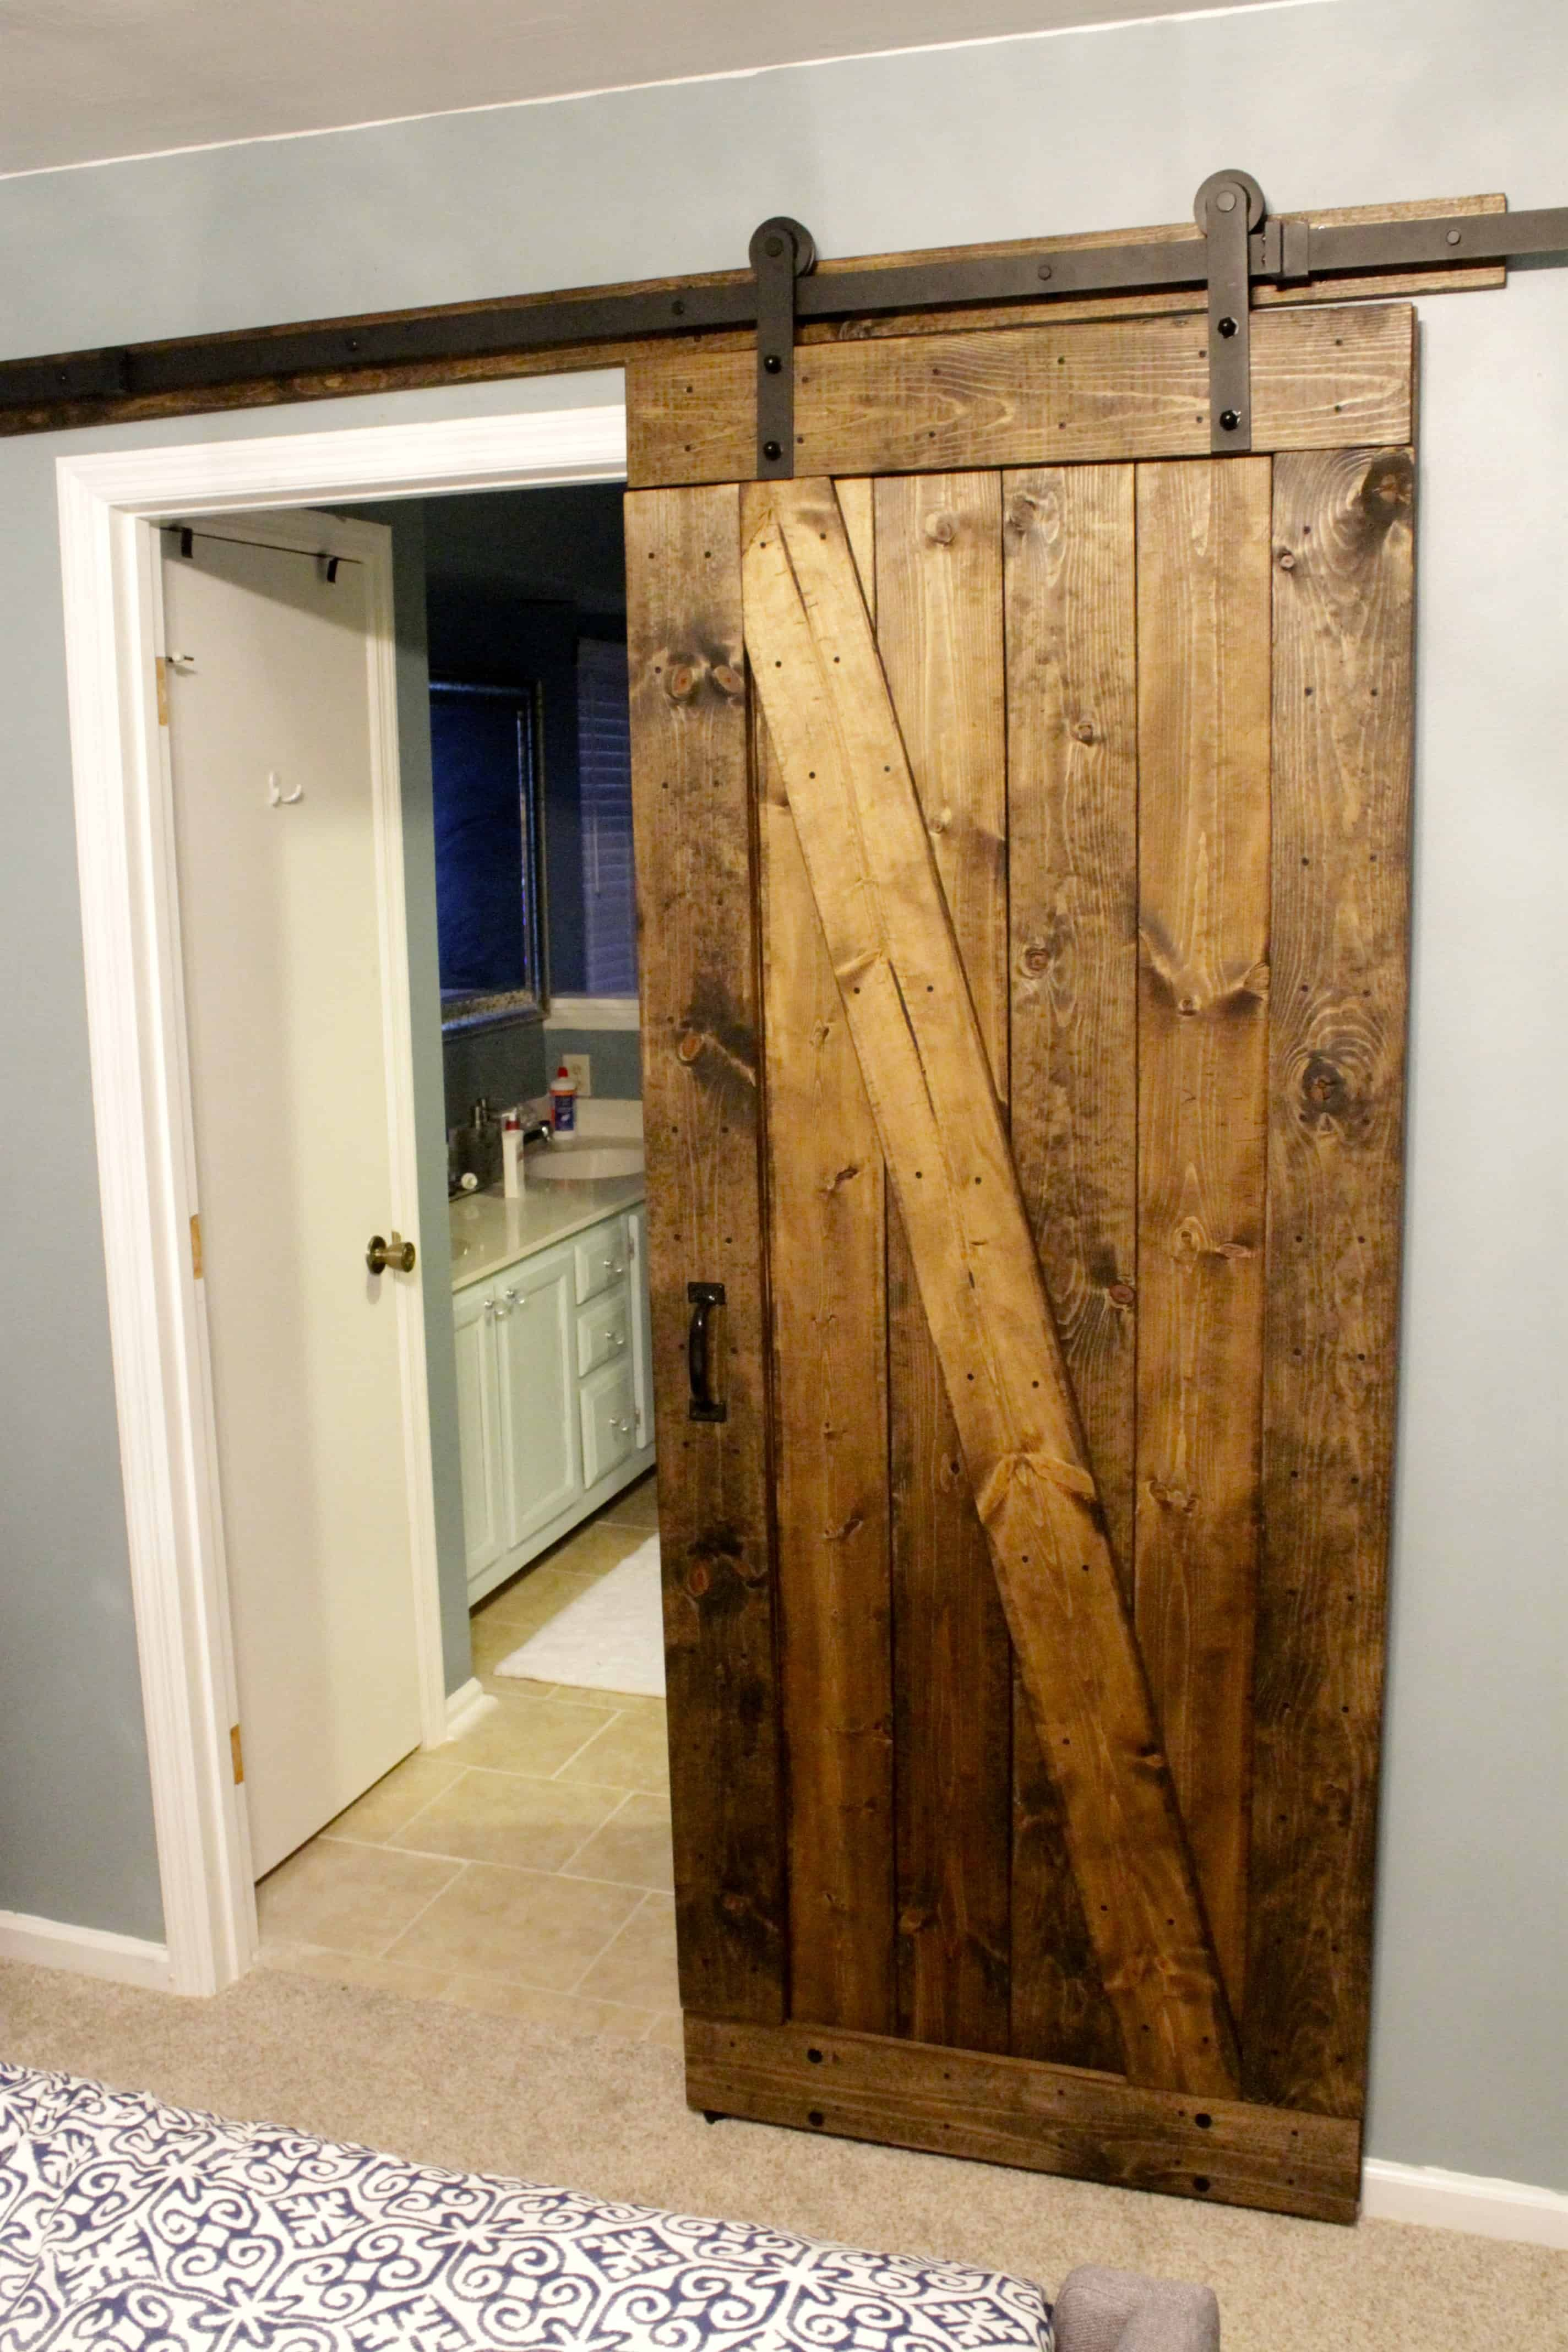 Can I Use A Barn Door For A Bathroom In 2020 Rustic Room Rustic Barn Door Rustic House